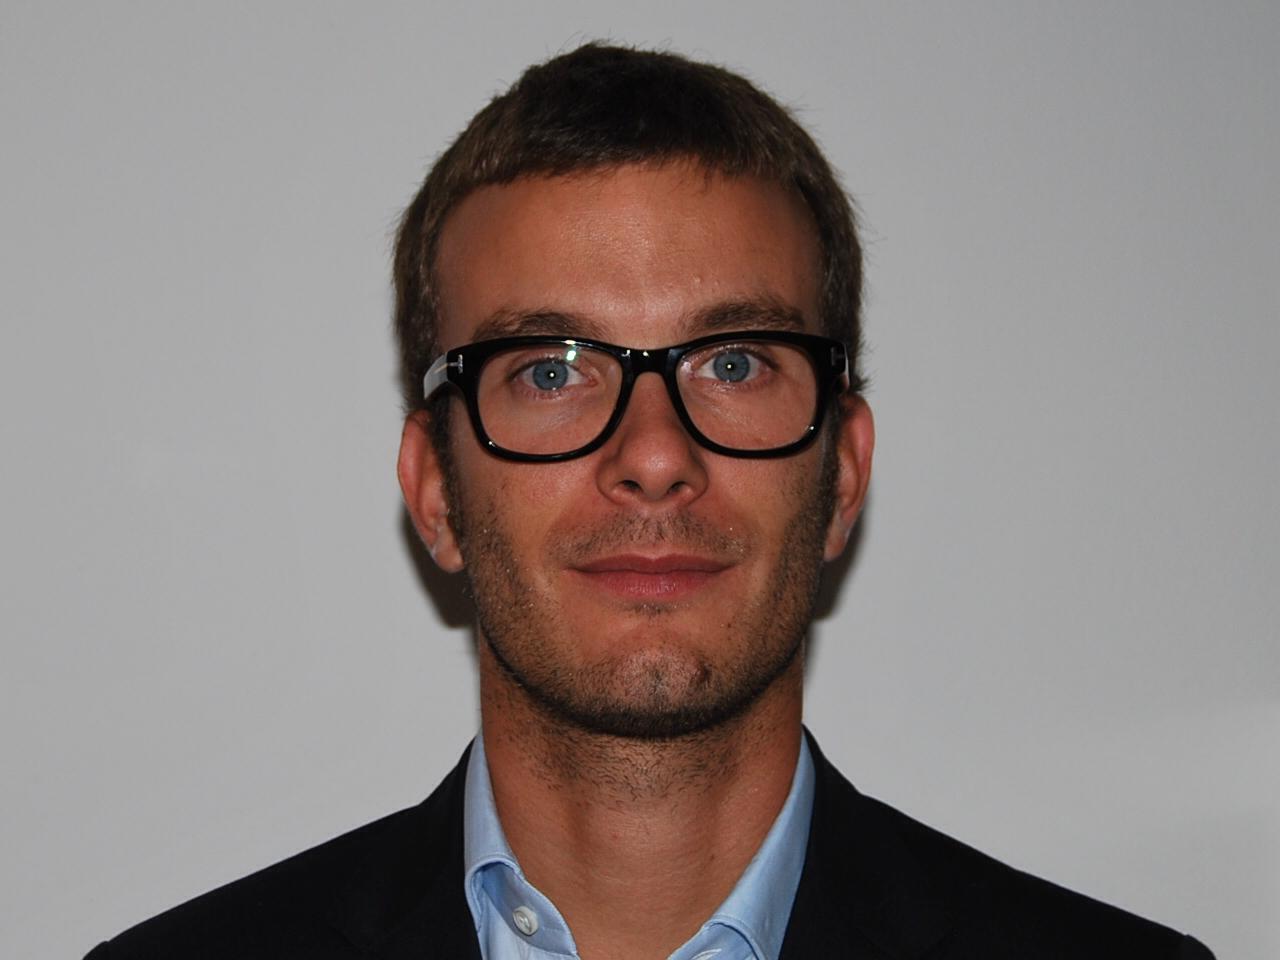 Marco Saccone è il nuovo Marketing & Communication Manager in Olimpia Splendid.